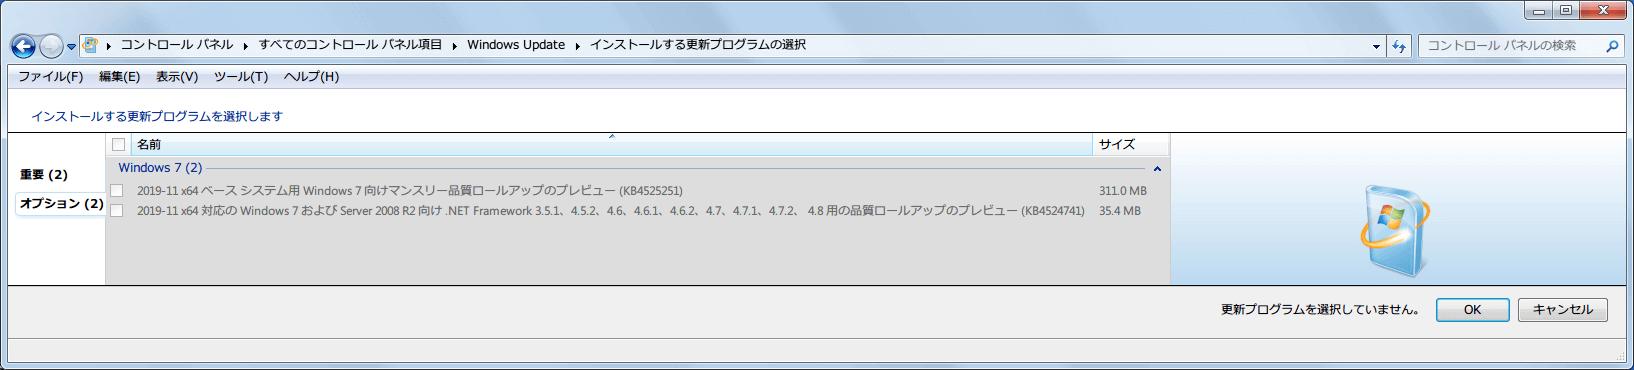 Windows 7 64bit Windows Update オプション 2019年11月分リスト KB4525251、KB4524741 非表示